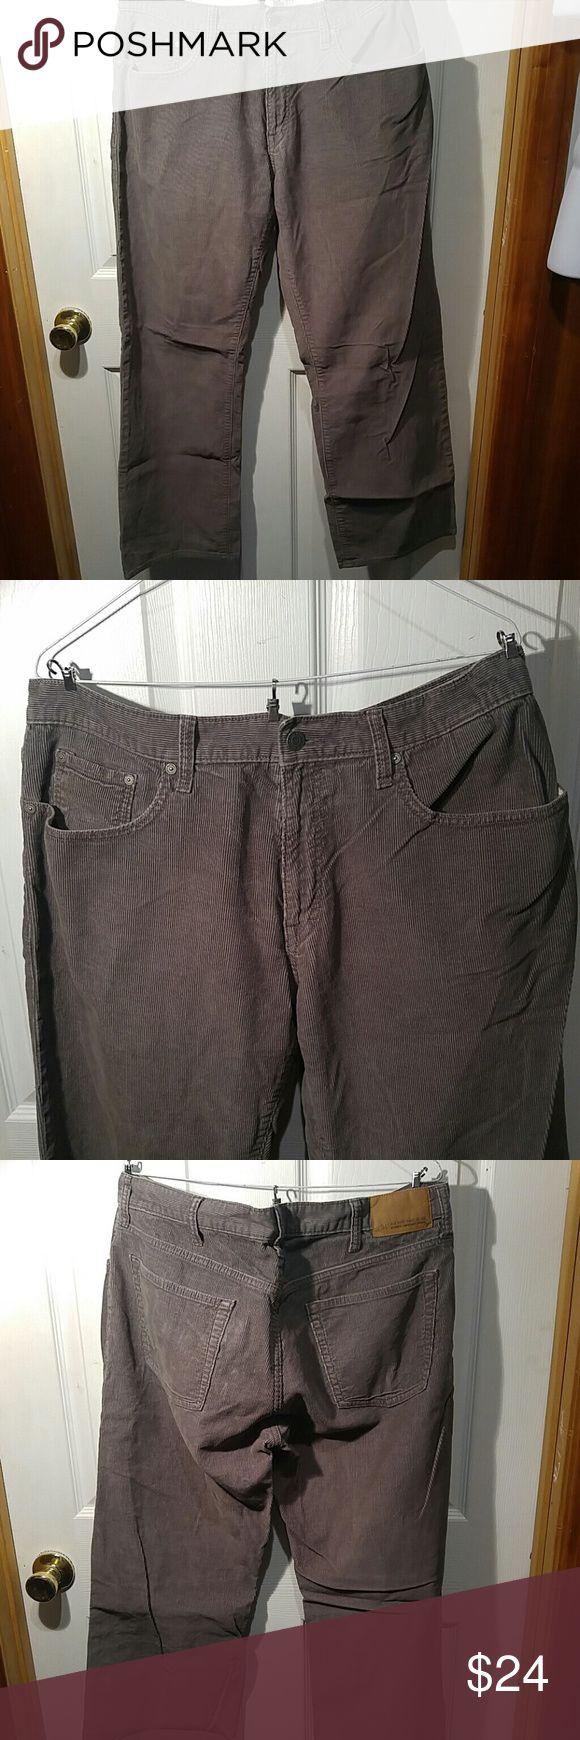 Mens old navy cord pants Loose 36x32 Old Navy Pants Corduroy